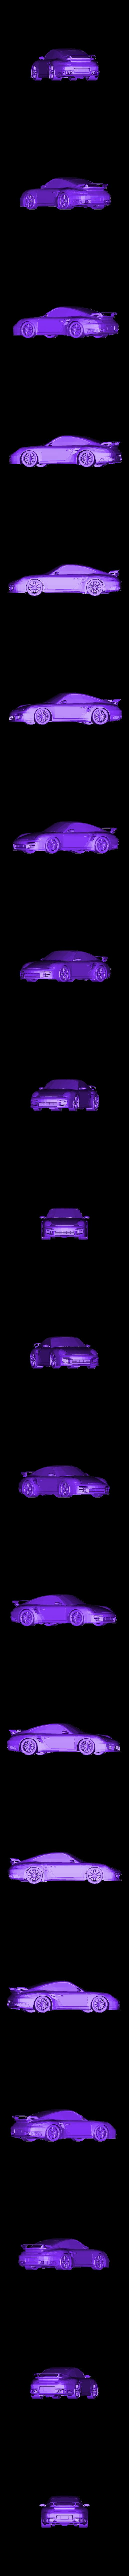 Porsche 911 GT2.stl Download free STL file Porsche 911 Gt2 • 3D print model, detaildesigner